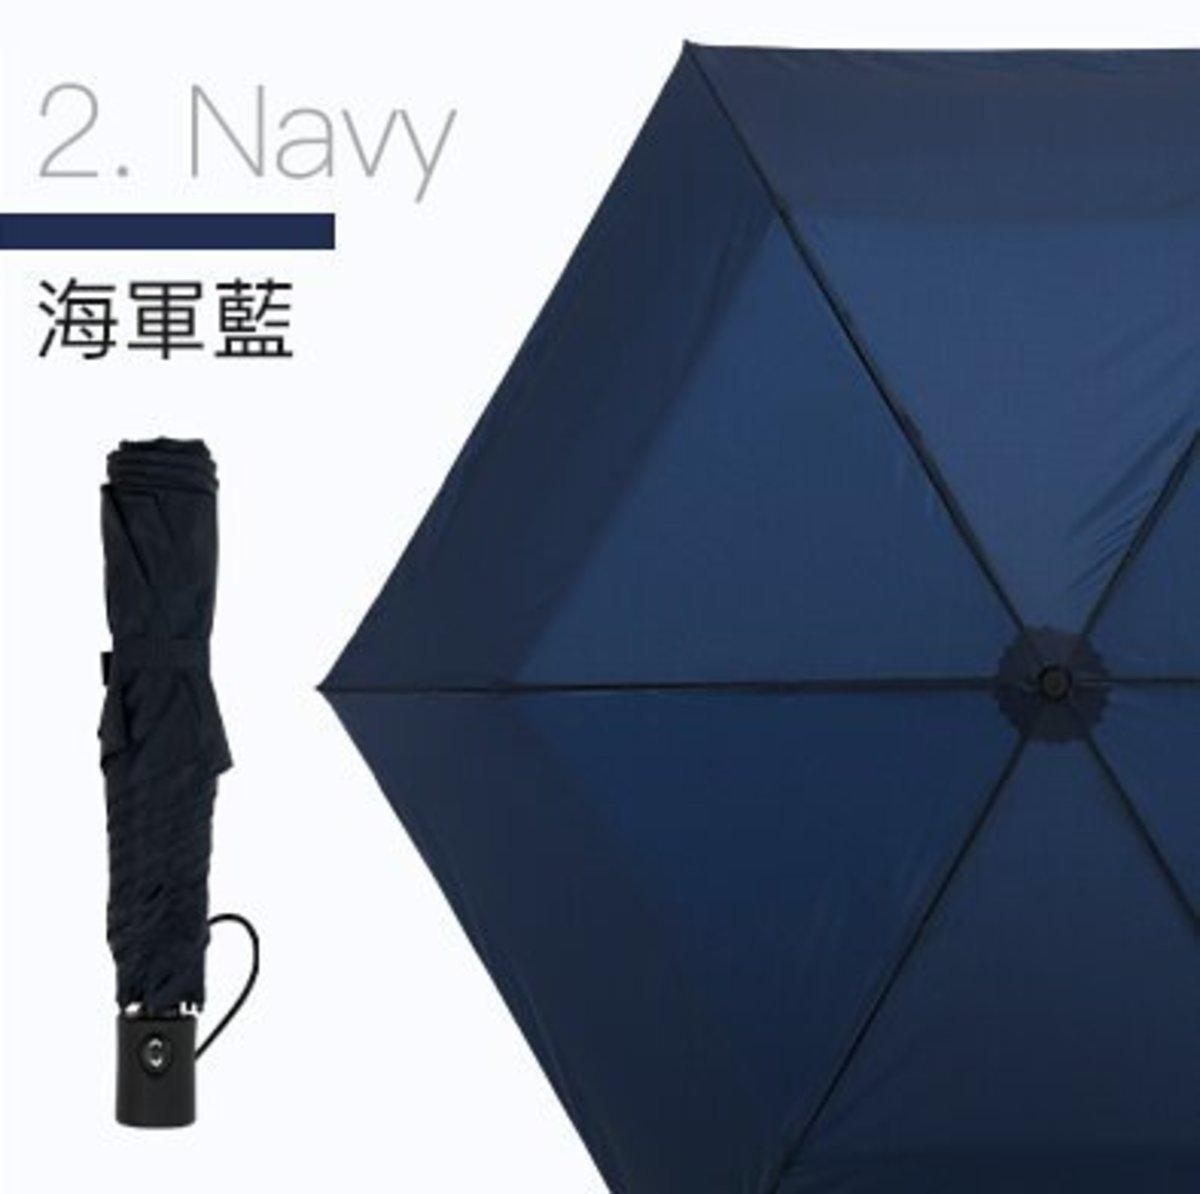 VERYKAL - 極輕一鍵式自動折傘 - 海軍藍